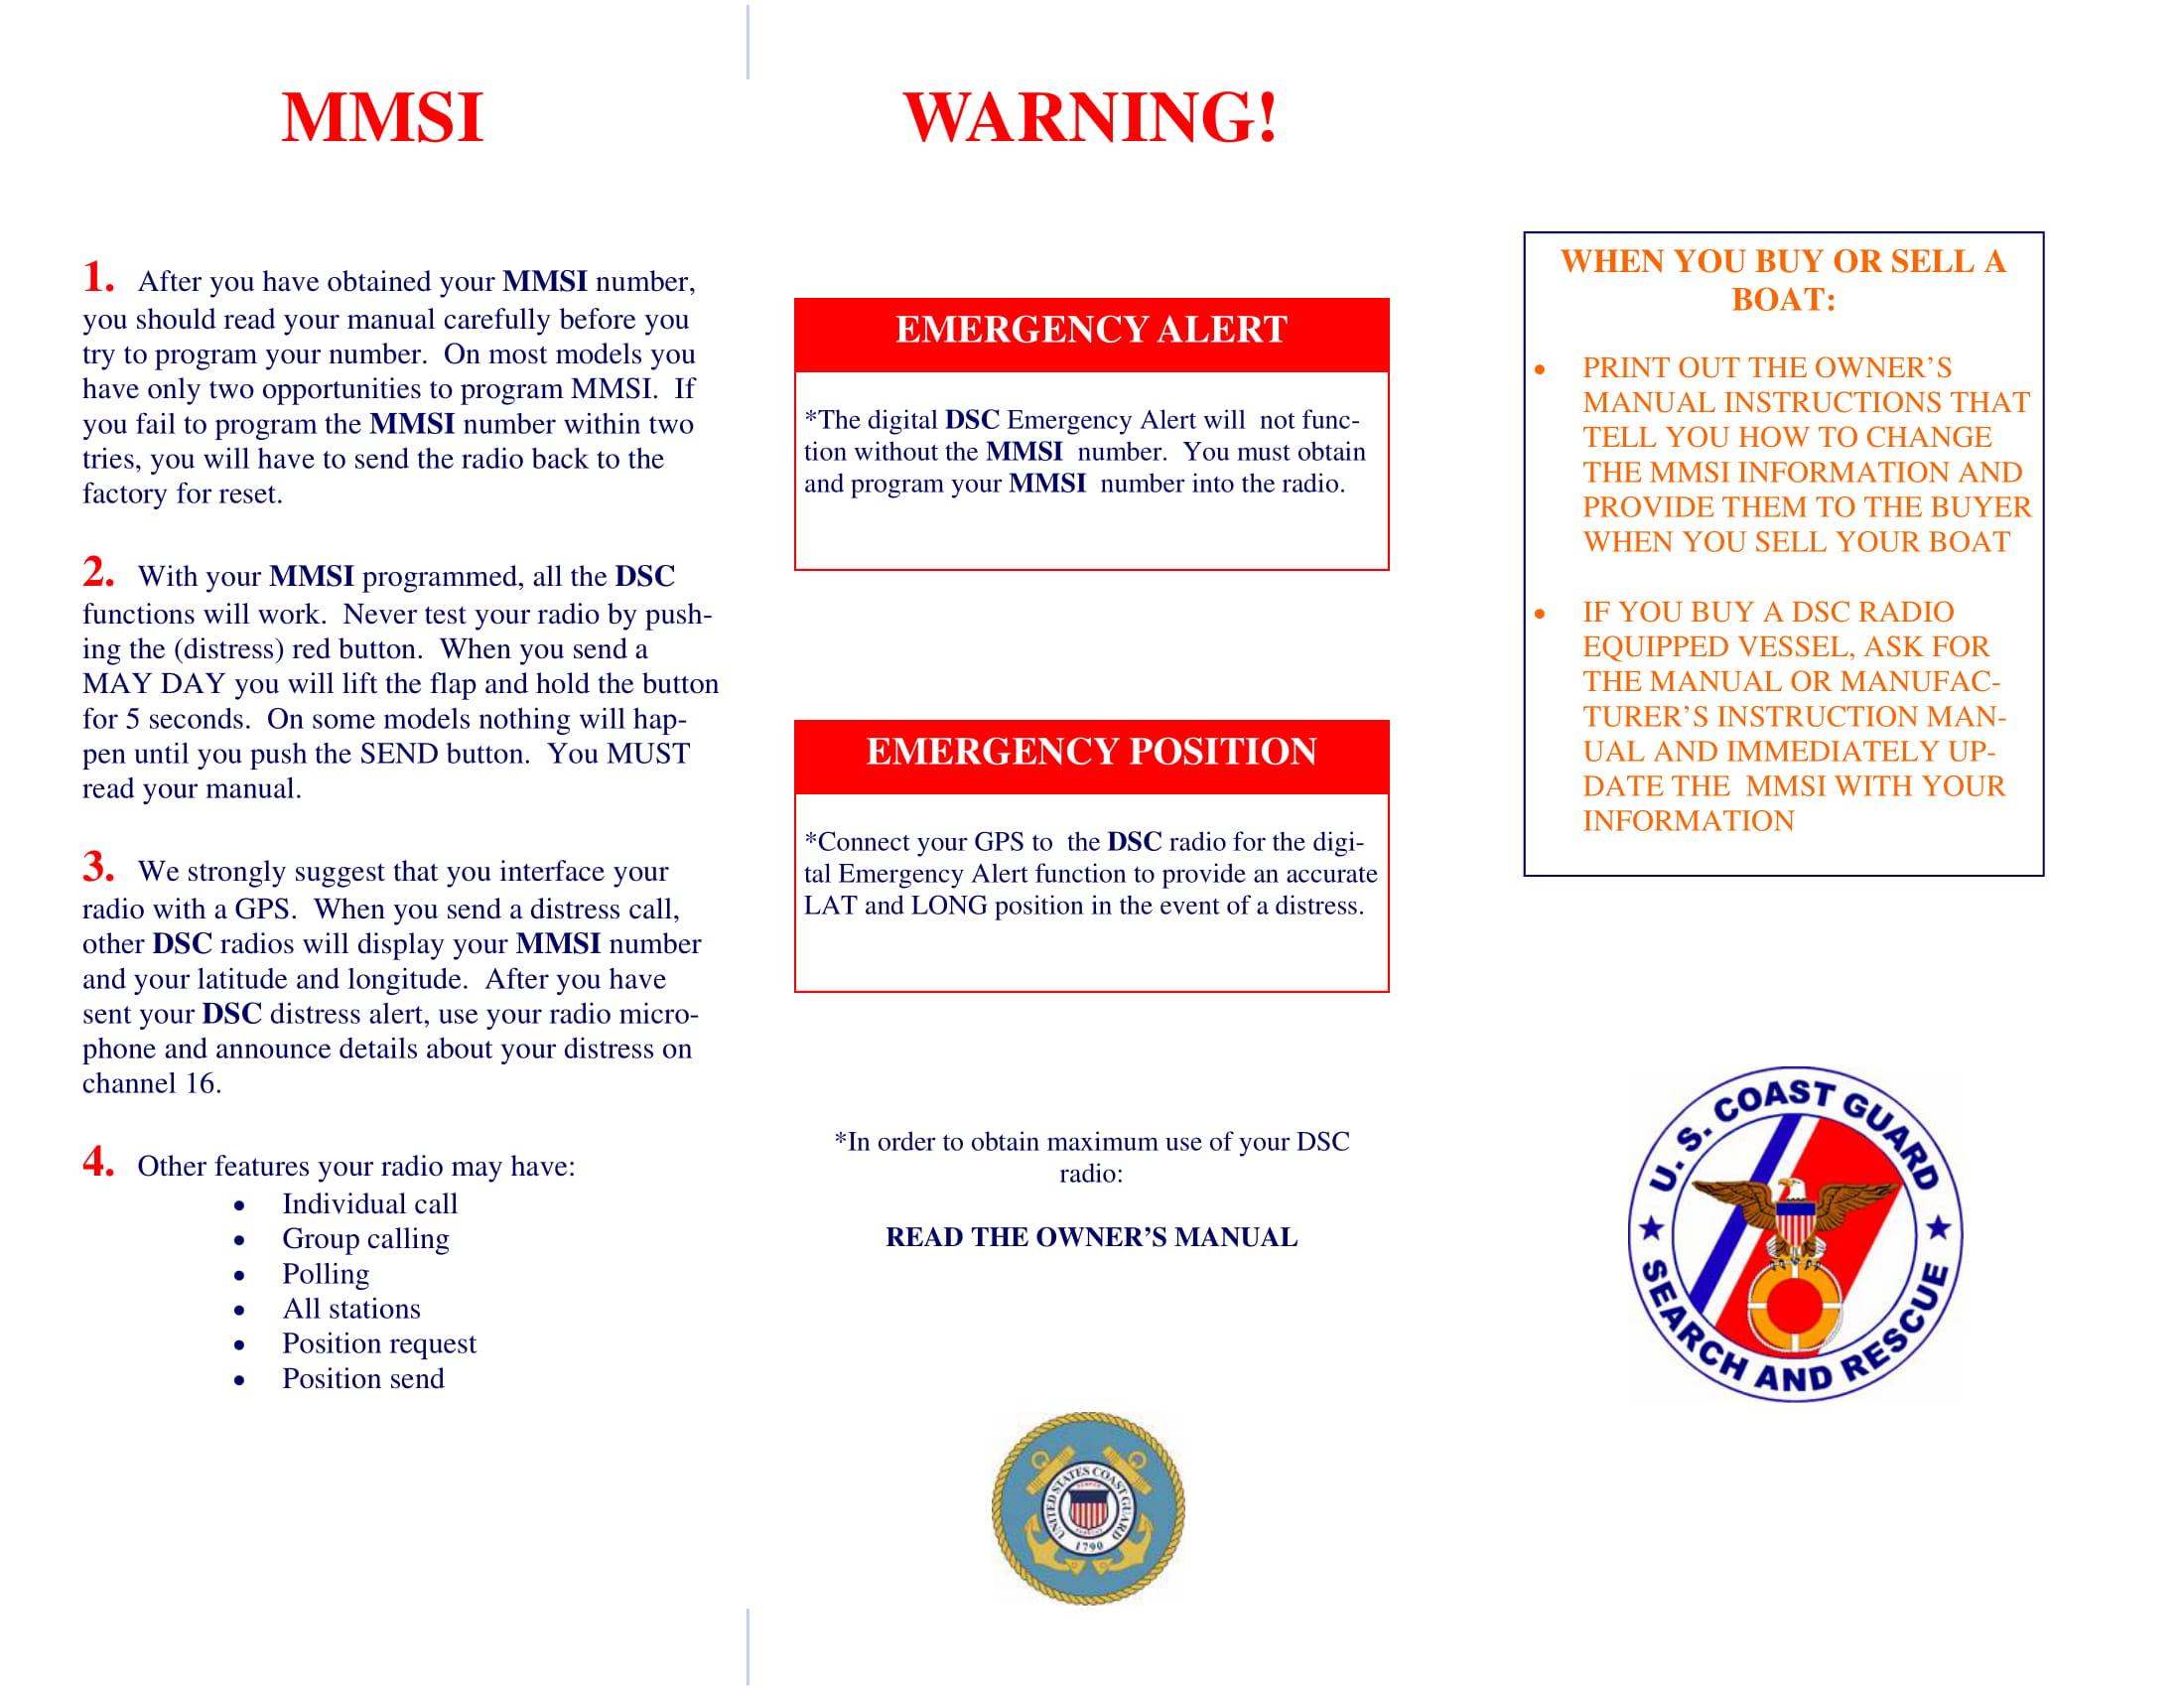 Coast Guard MMSI Brochure Page 2